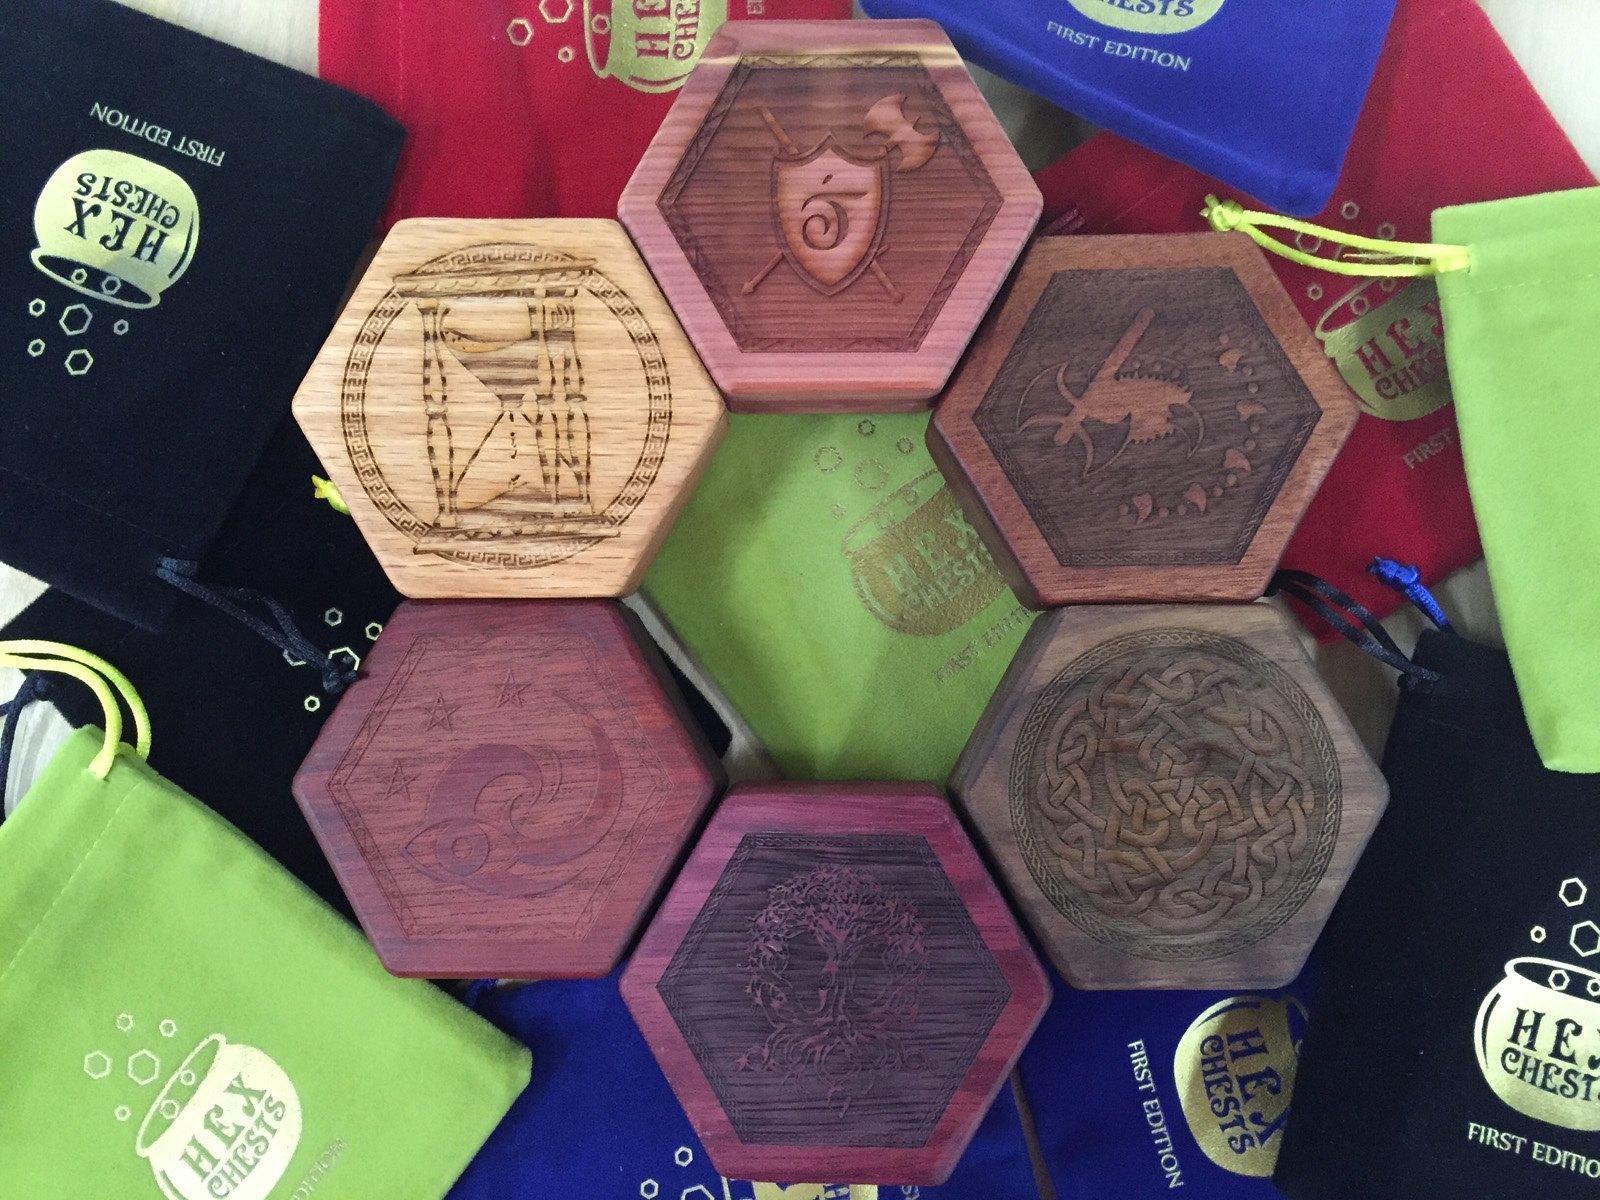 Aromatic cedar, mahogany, walnut, purpleheart, bloodwood, red oak (Top-clockwise)